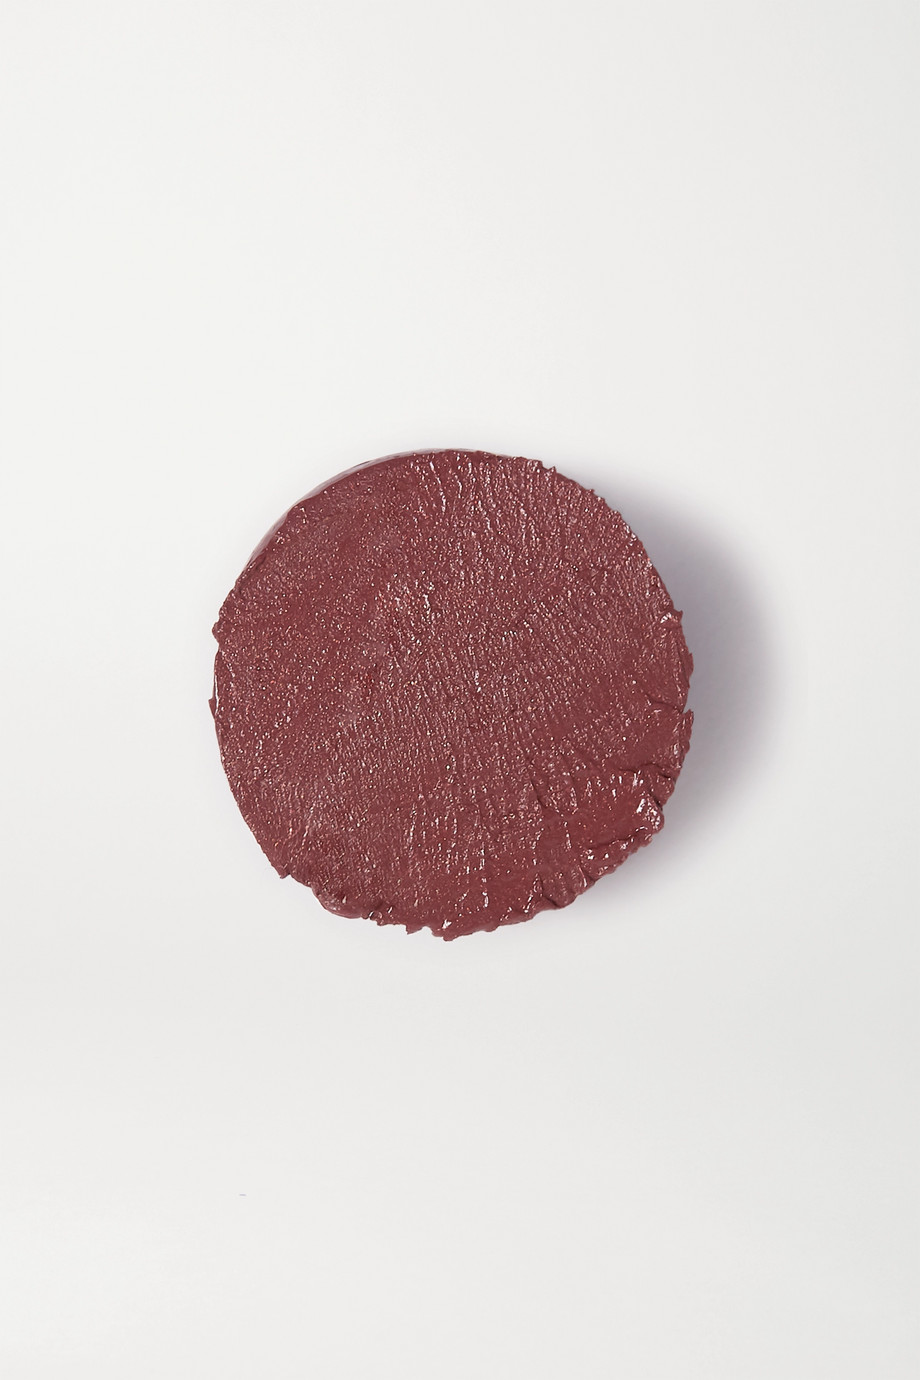 Charlotte Tilbury K.I.S.S.I.N.G Lipstick - Pillow Talk Intense